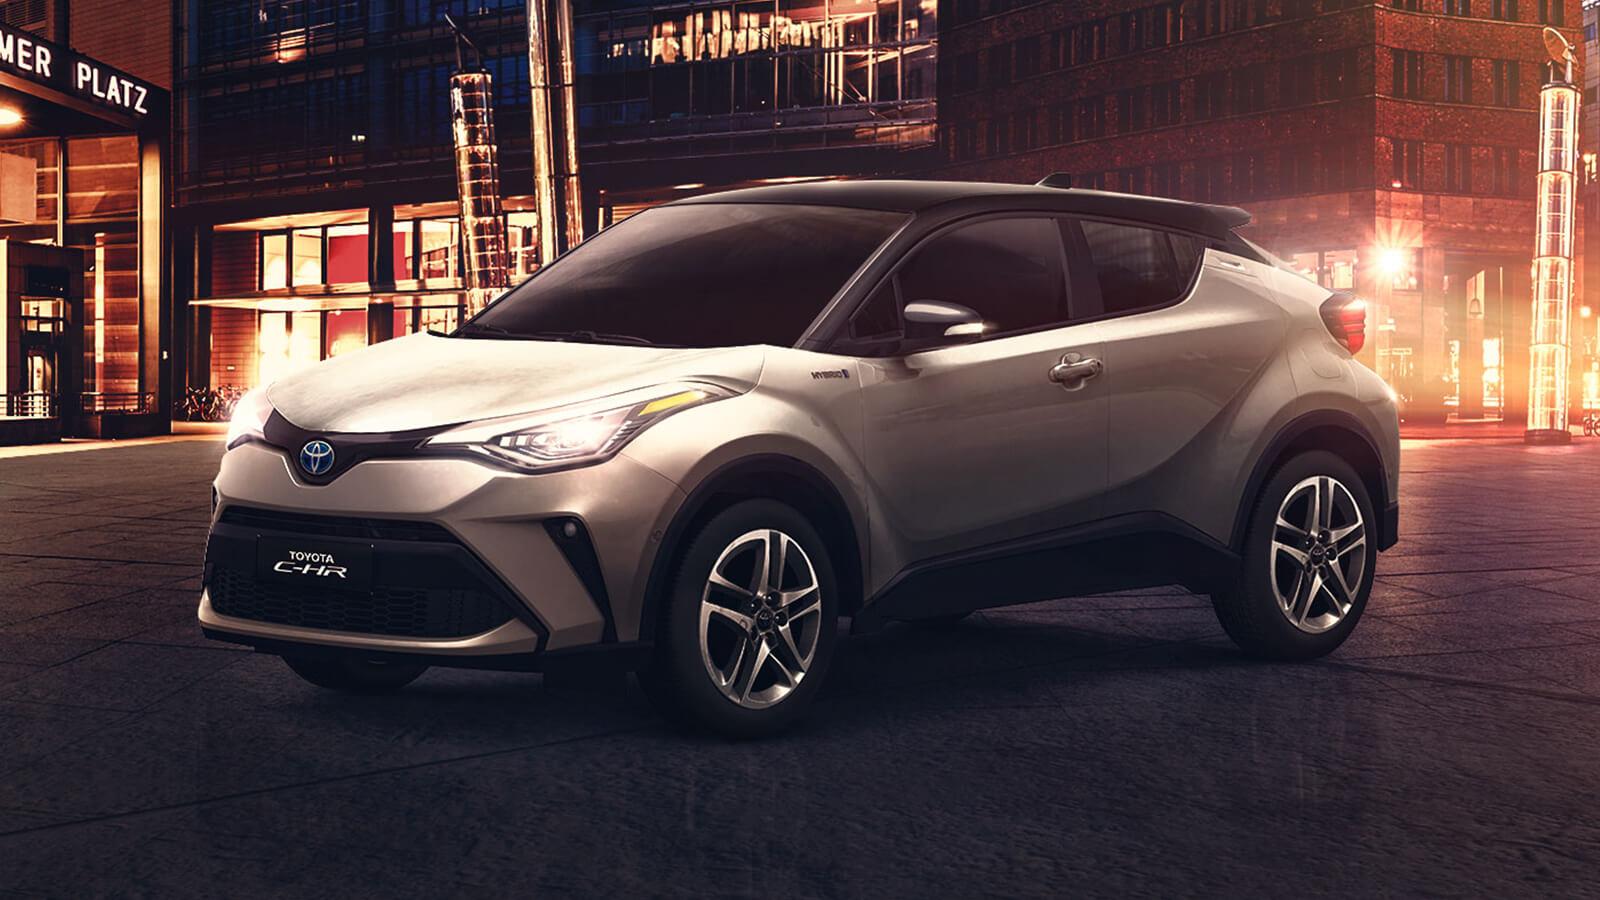 Toyota chr en la noche vista lateral exterior